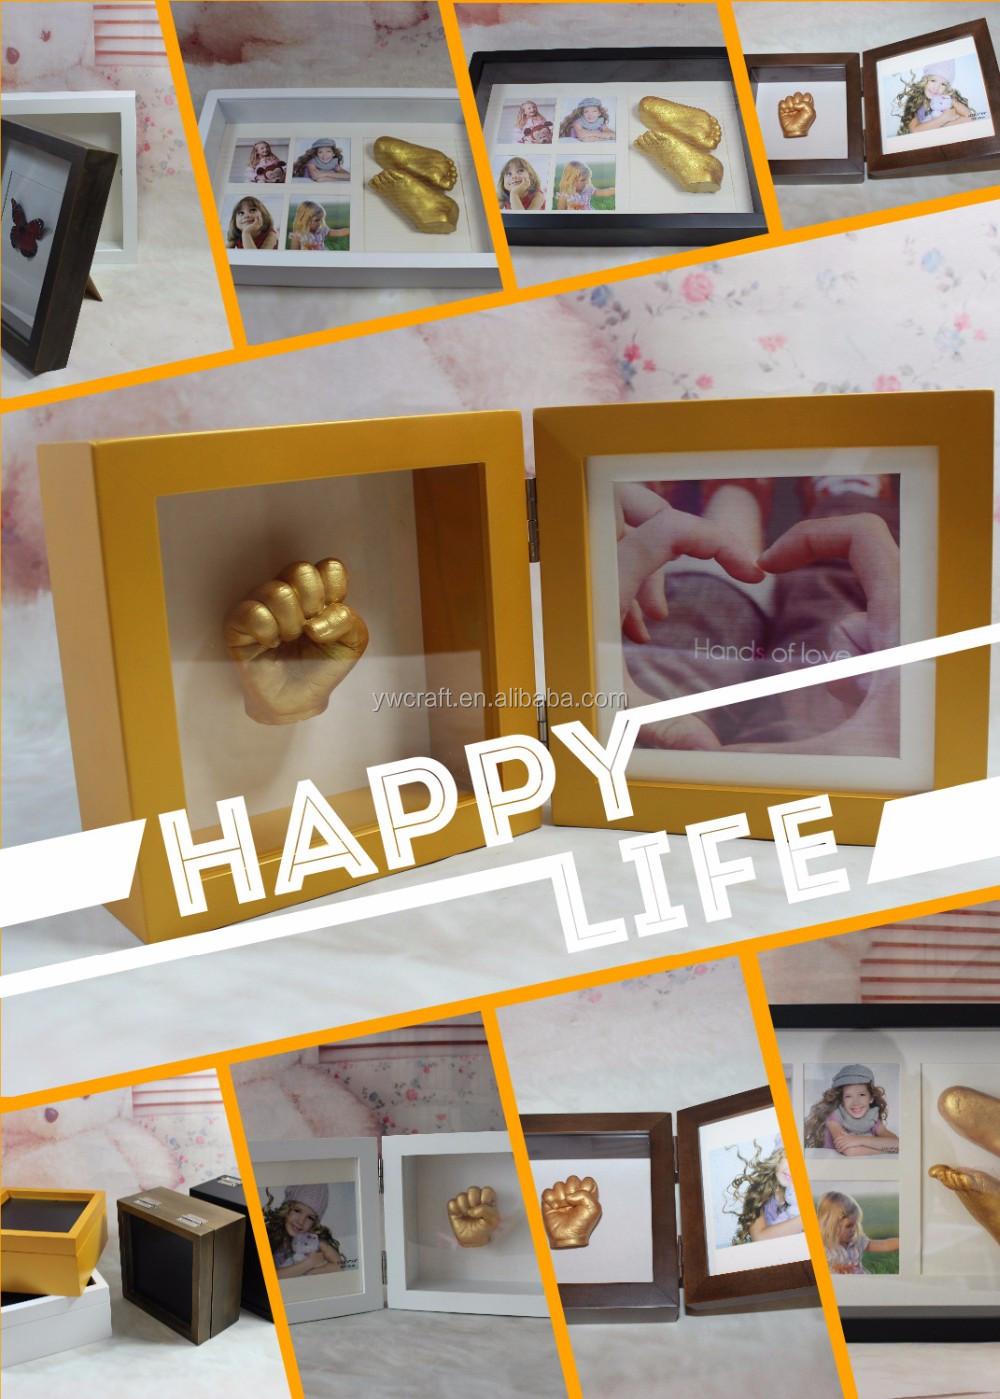 3d Massivholz Baby Handprinting Diy Shadow Box Bilderrahmen ...